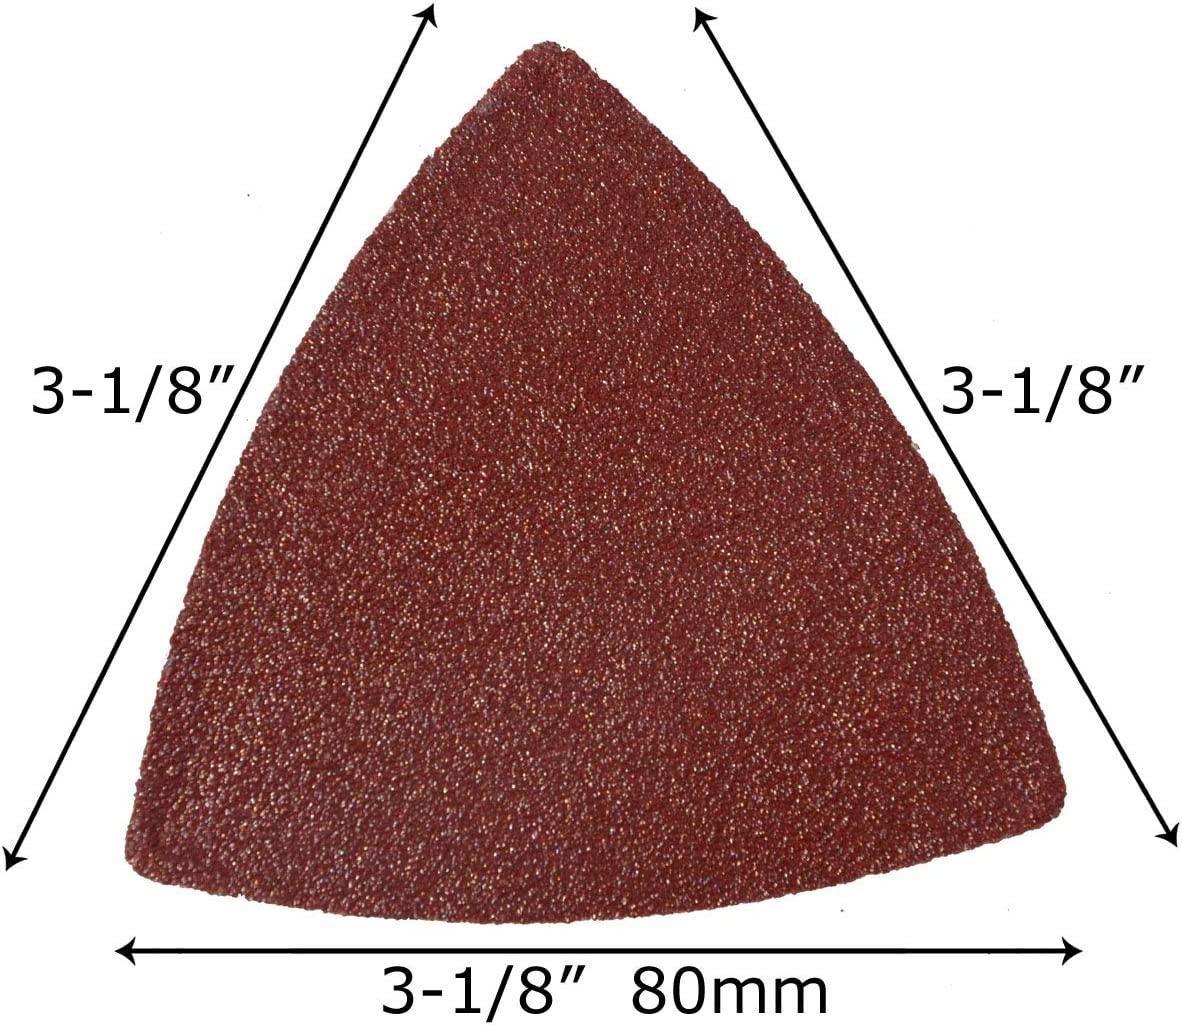 oszillierend 55 St/ück XXGO XG5501U Schleifpapier 80 mm dreieckig K/örnung 60//80//100//120//240